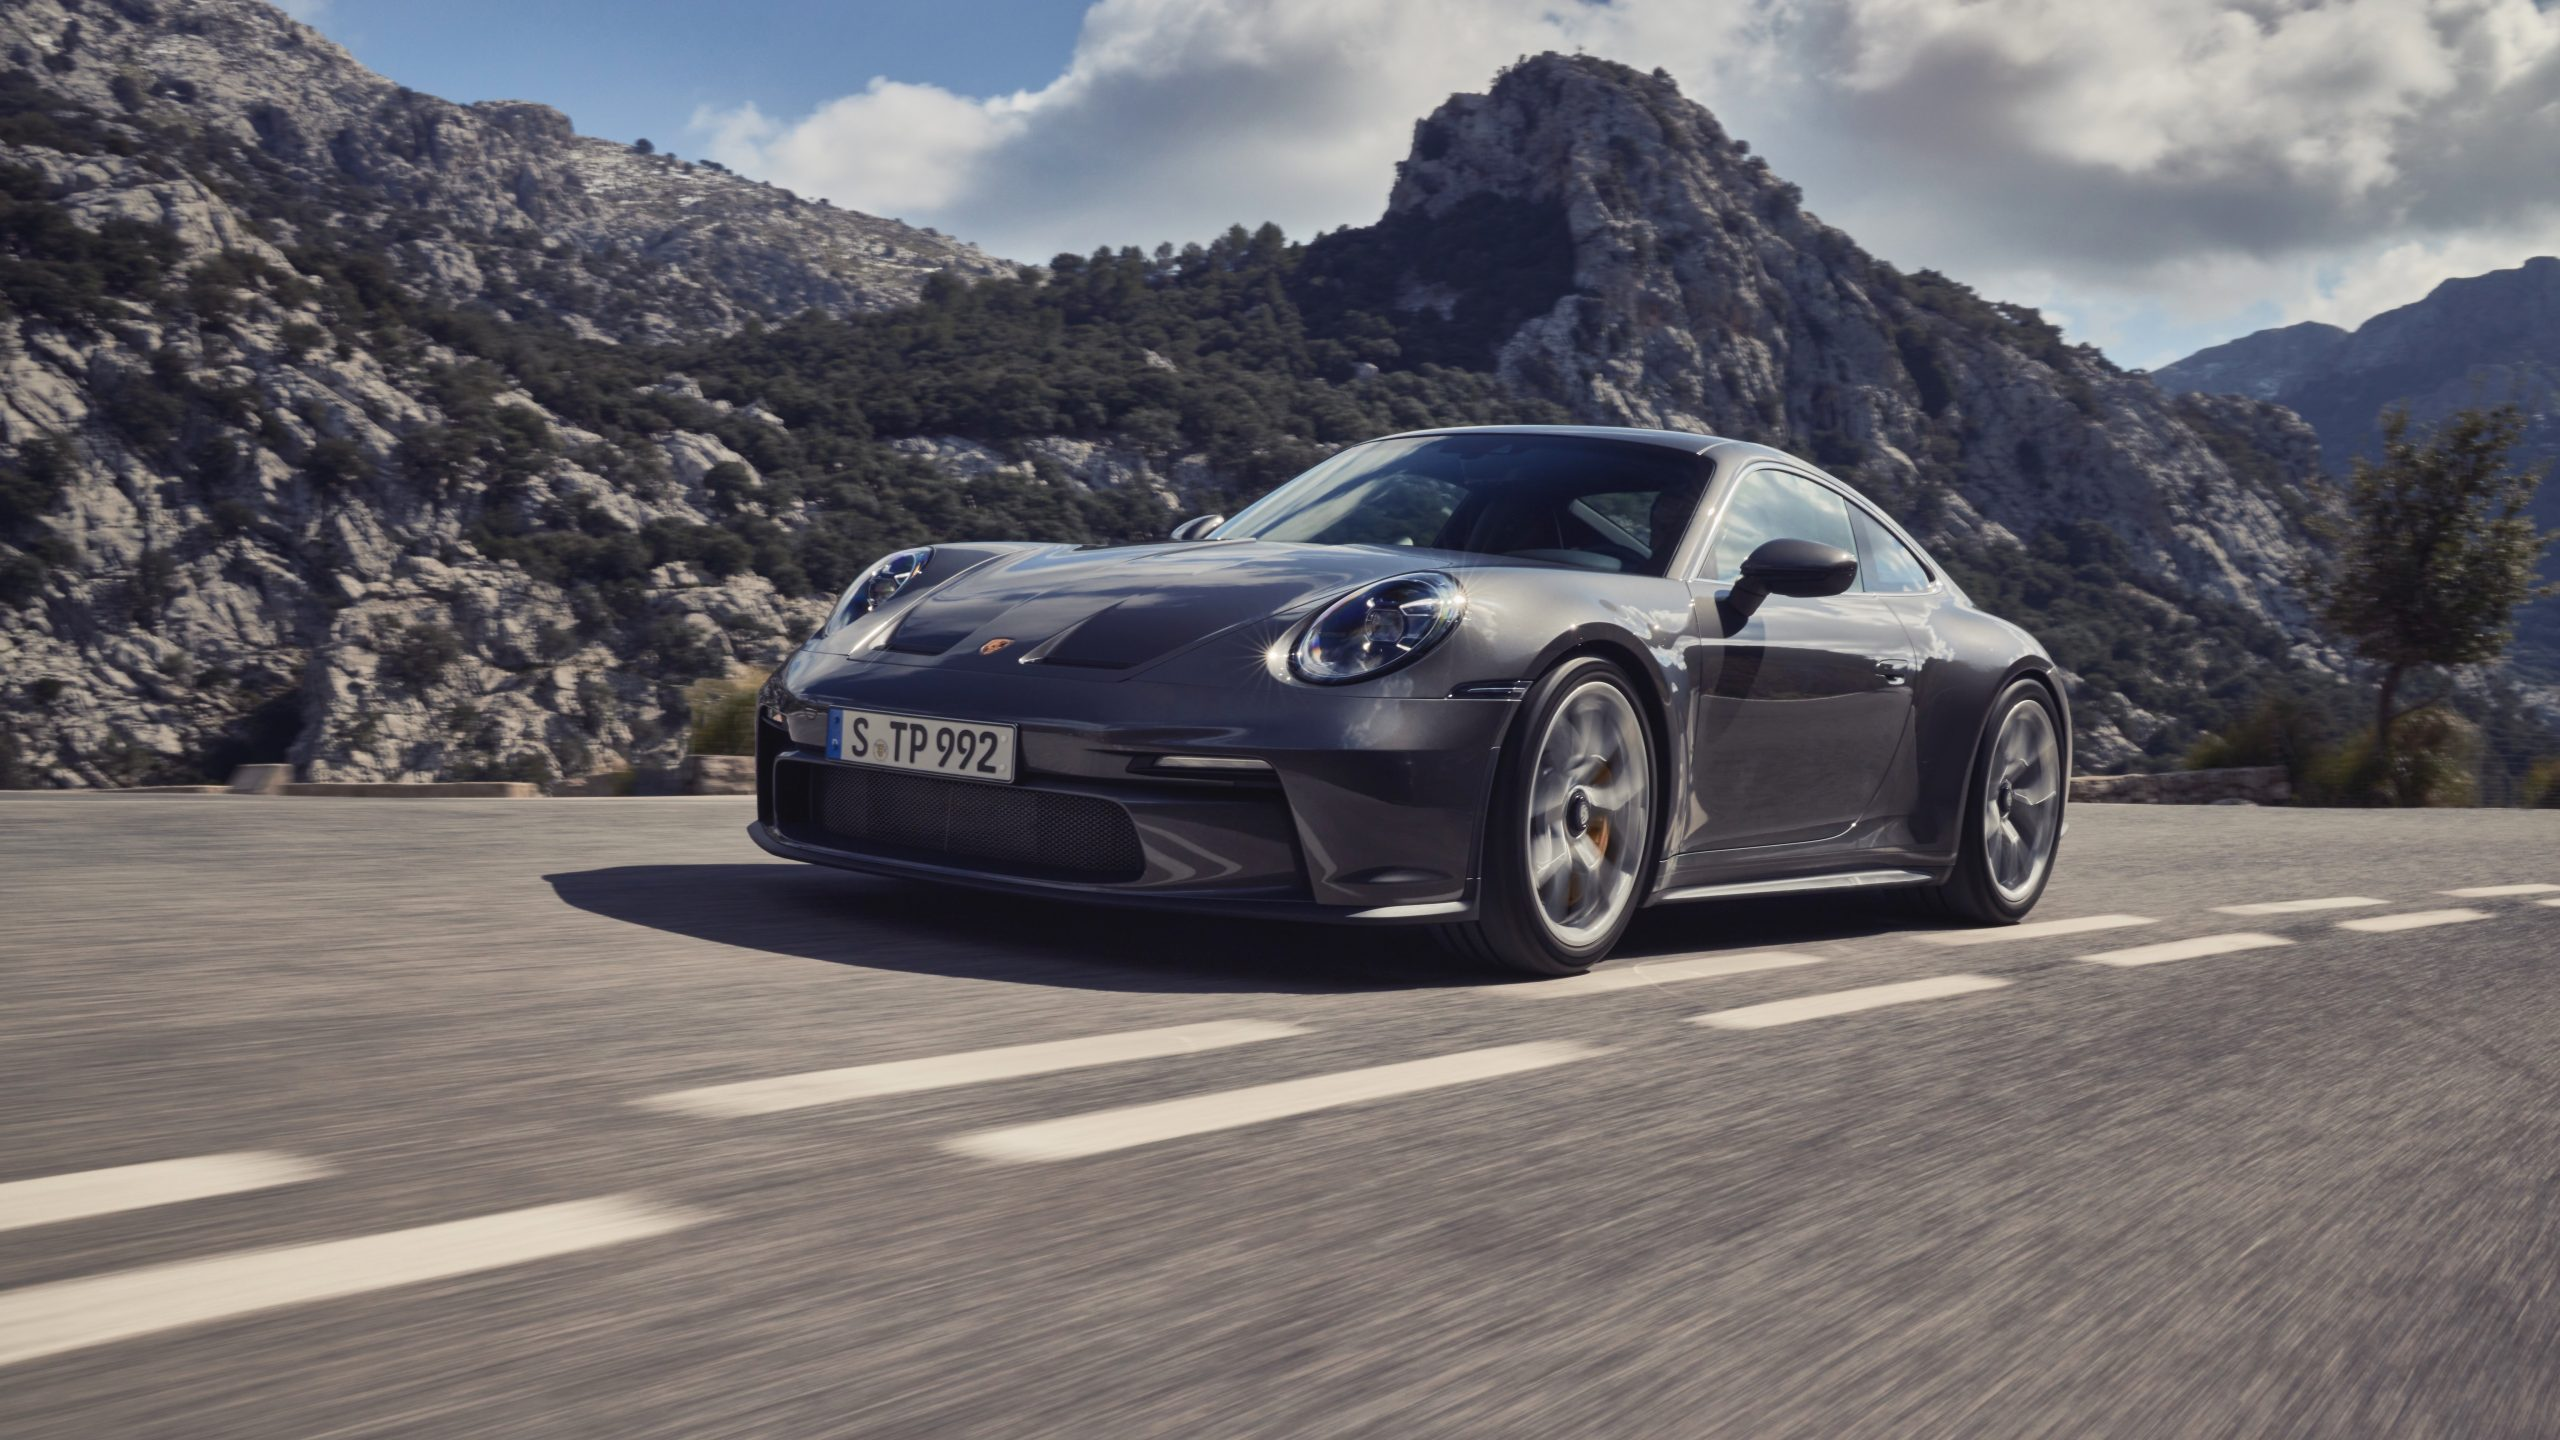 img 22 scaled Τι δίνει στην Porsche 992 GT3 Touring, τη δική της μοναδική γοητεία 911, 992, Porsche, Porsche 911, Porsche 911 GT3, sportscar, zblog, ειδήσεις, Νέα